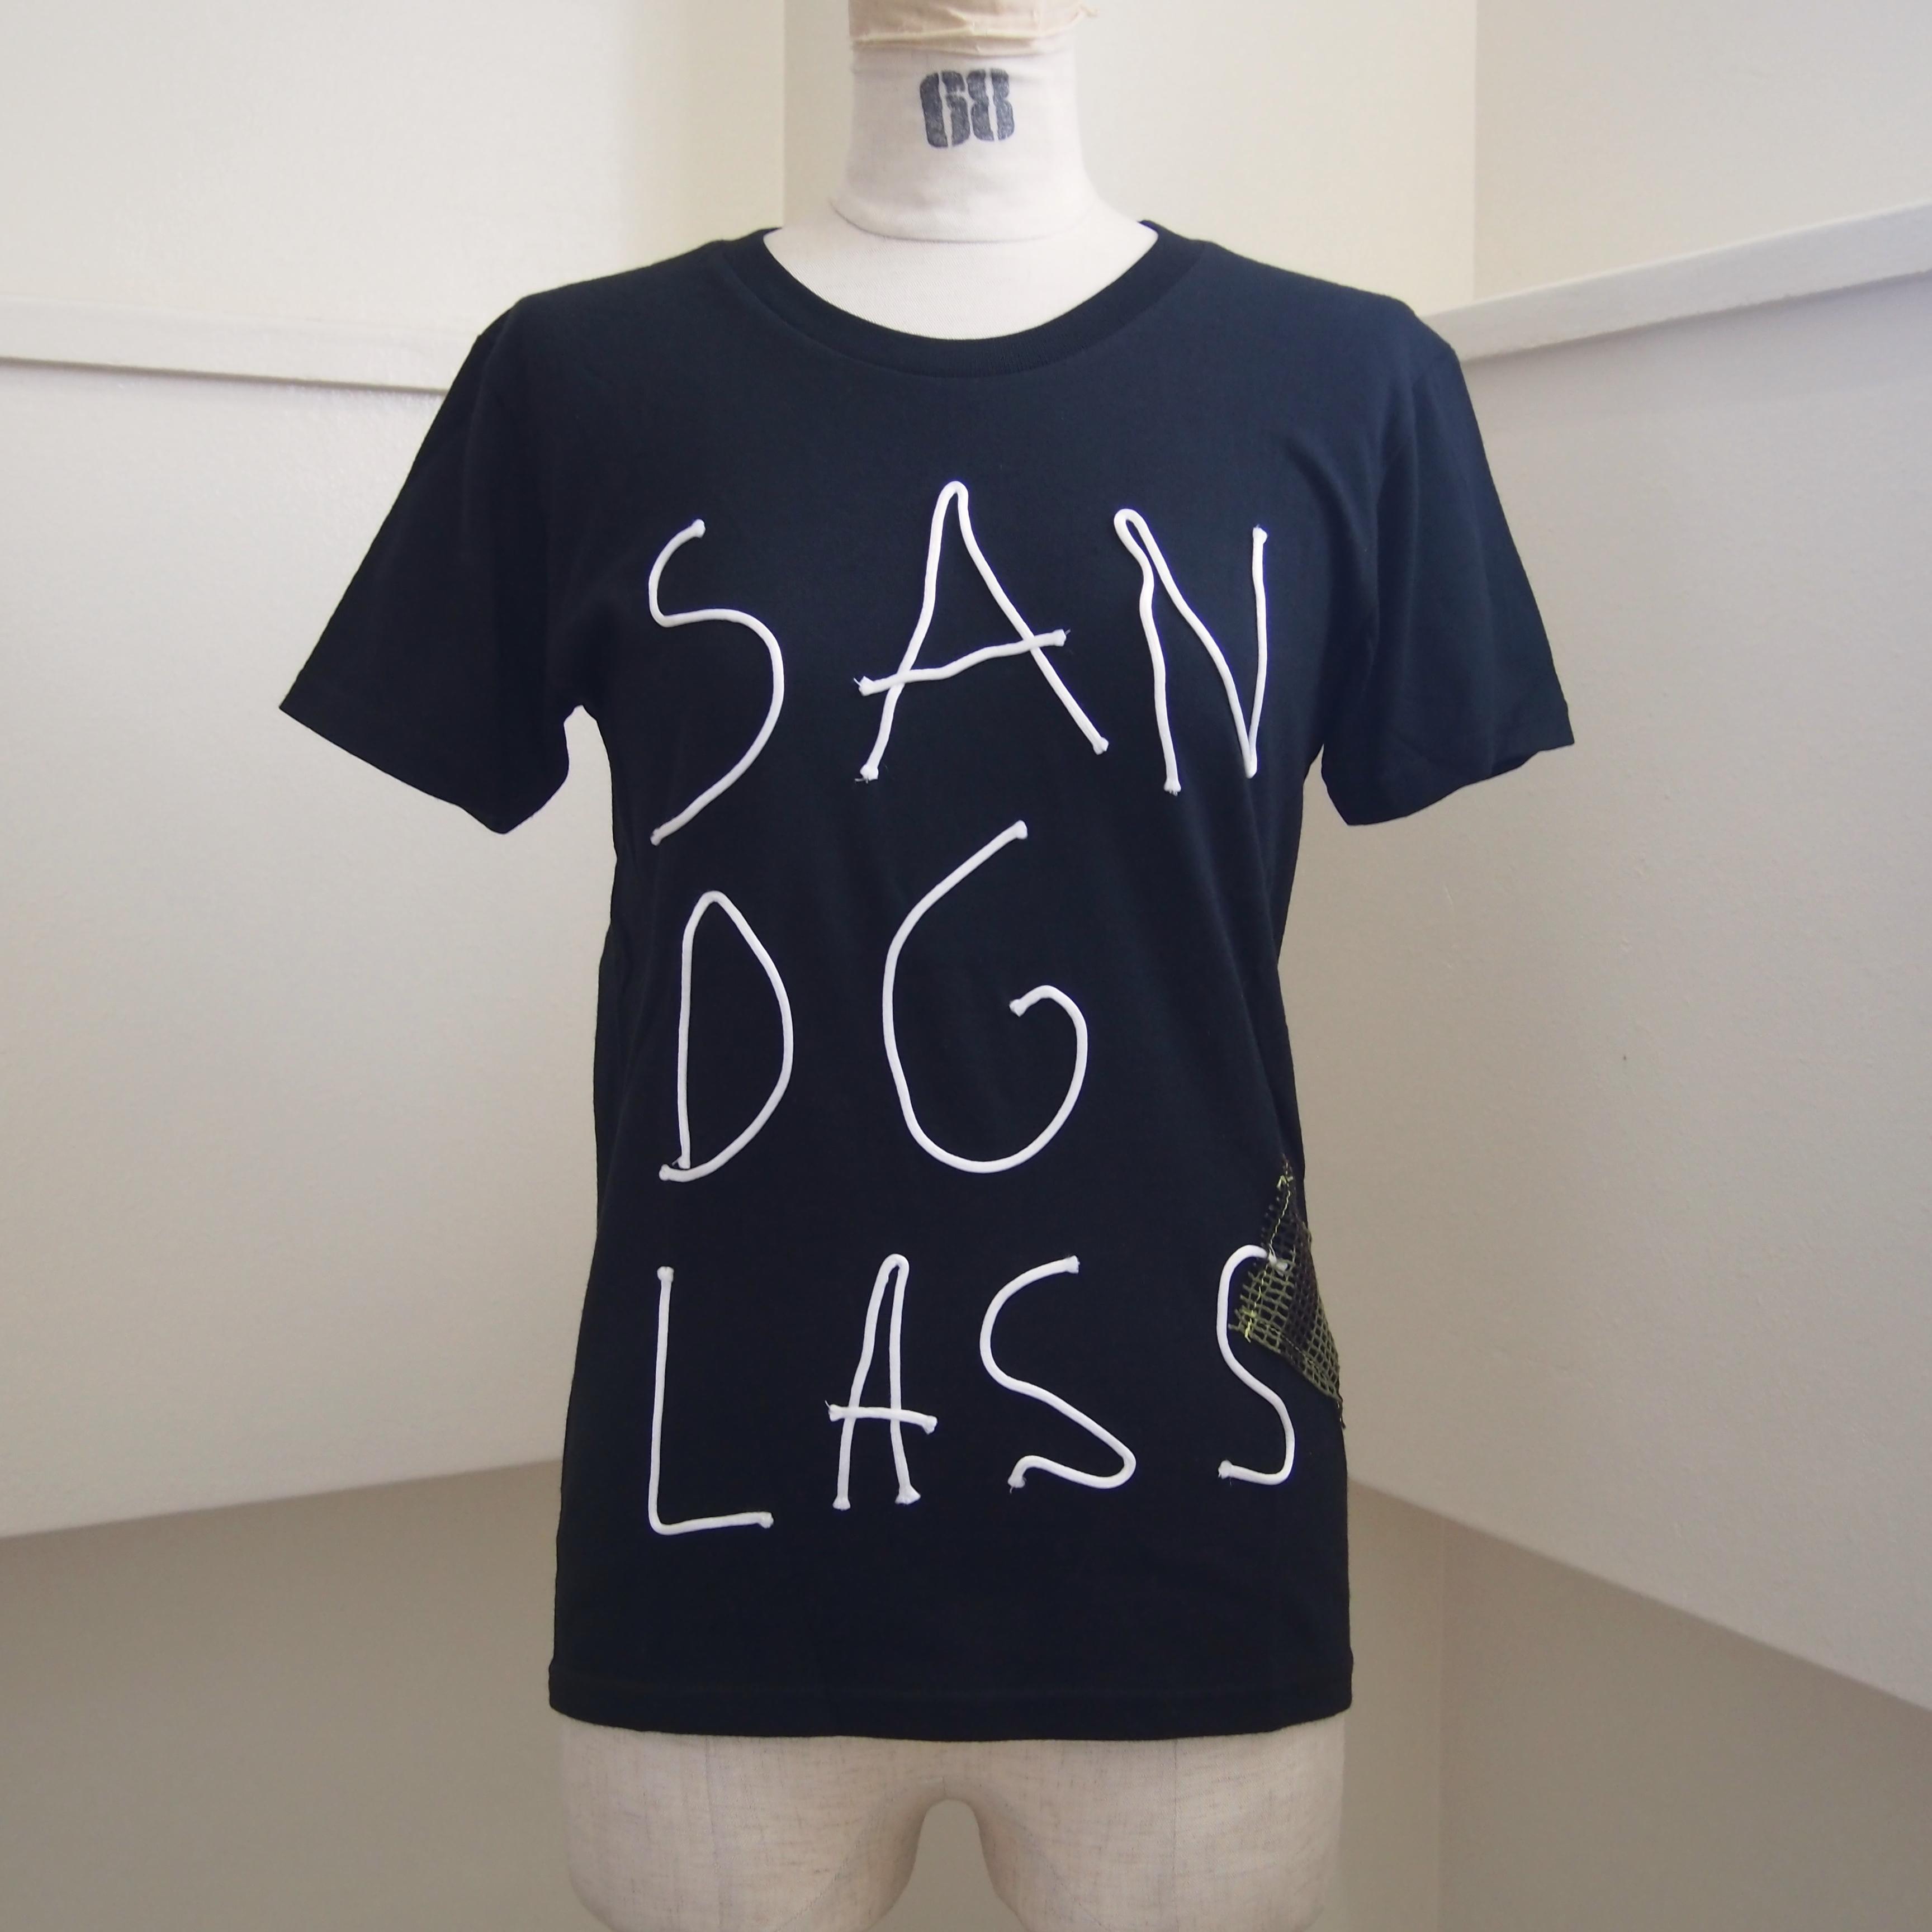 【sandglass】cord T-shirt (black) / 【サンドグラス】コードTシャツ(ブラック)